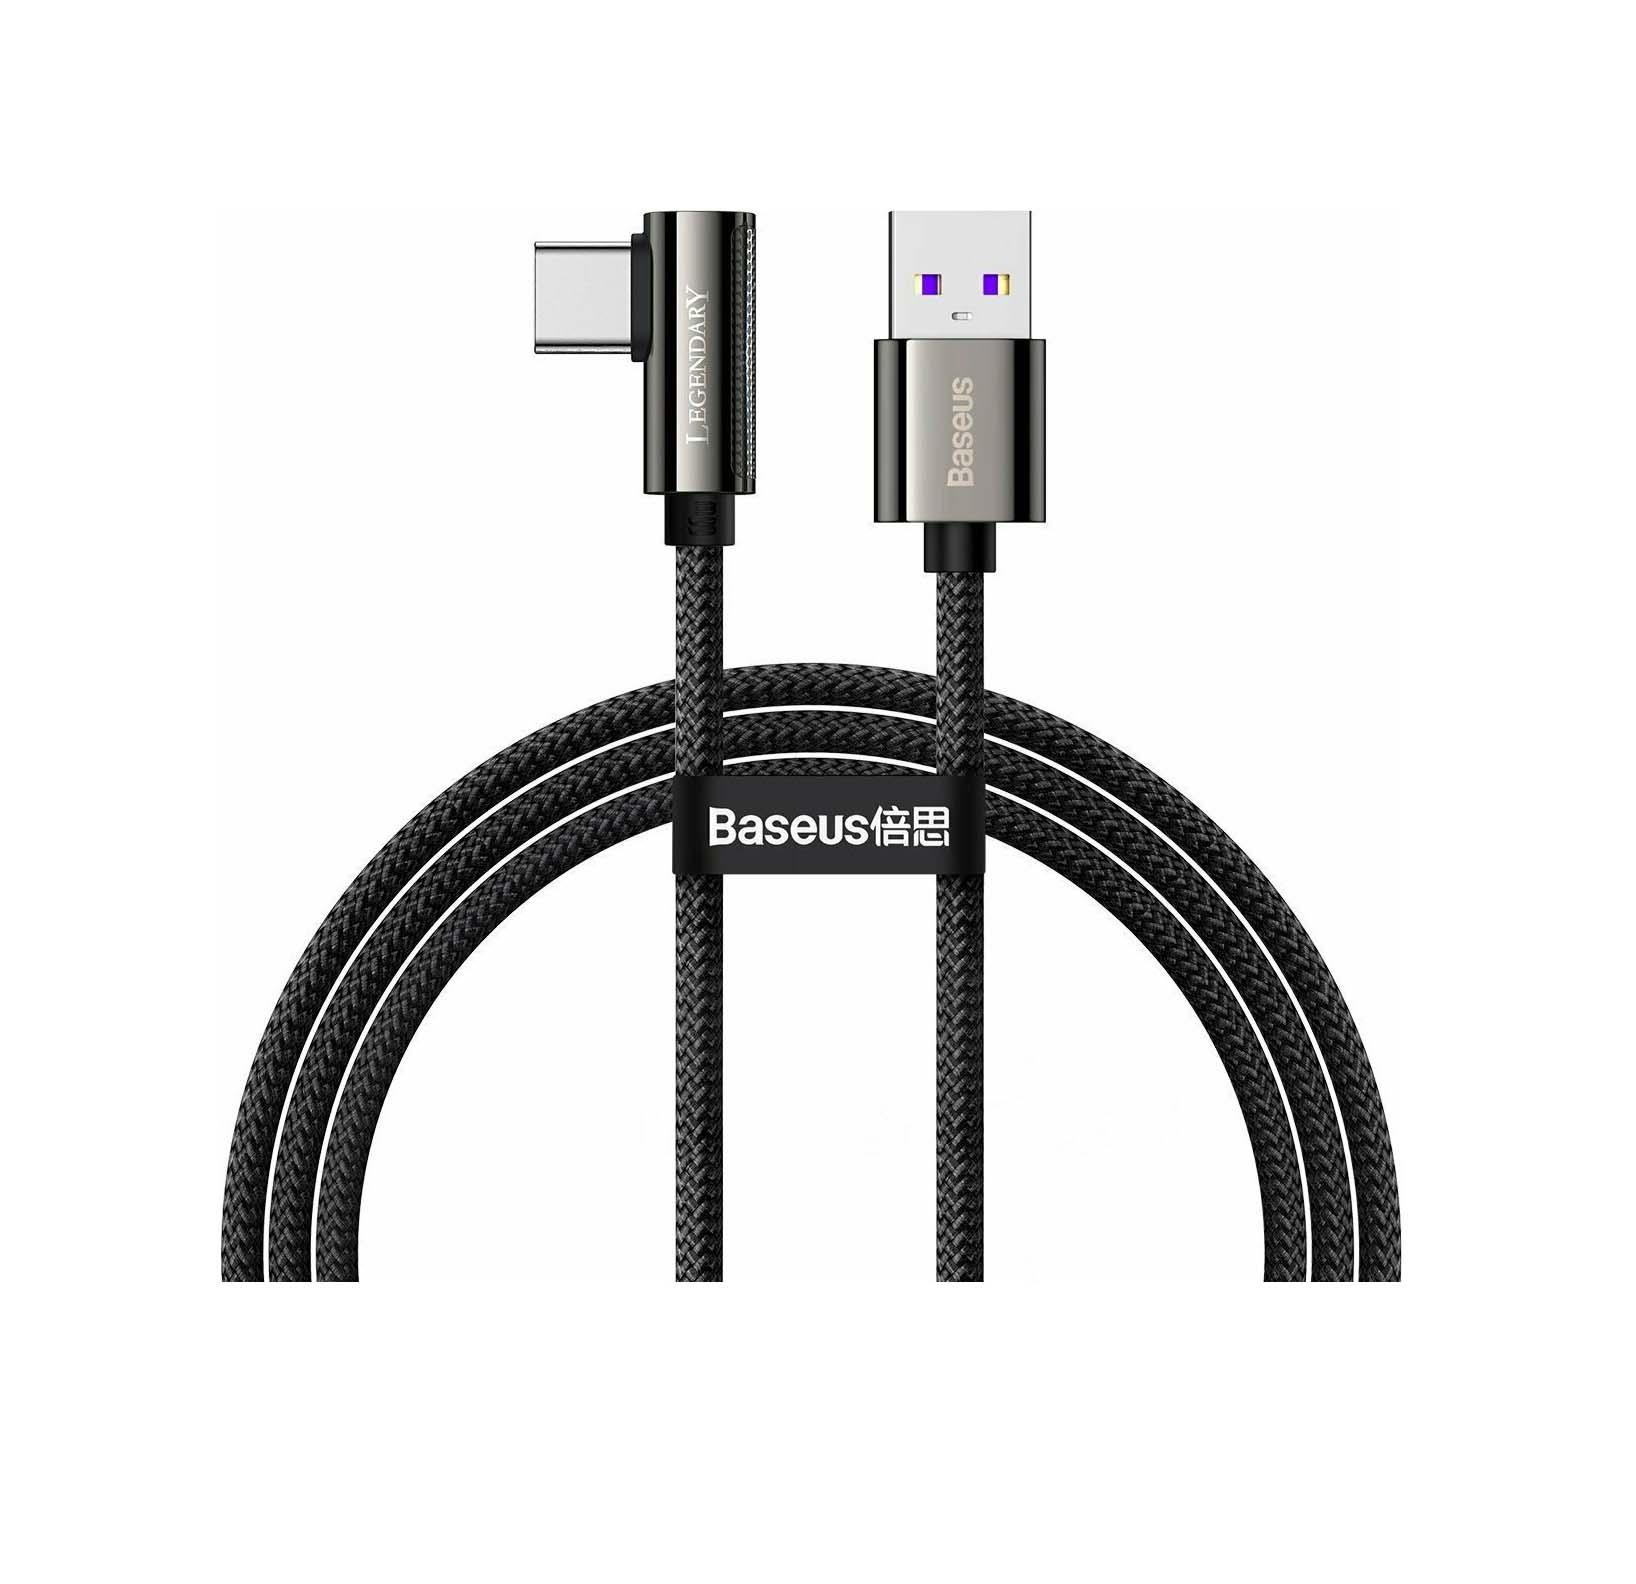 Baseus USB Cable - Legend Series Elbow CATCS-B01 Typ C 1M 66W Quick Charging Black